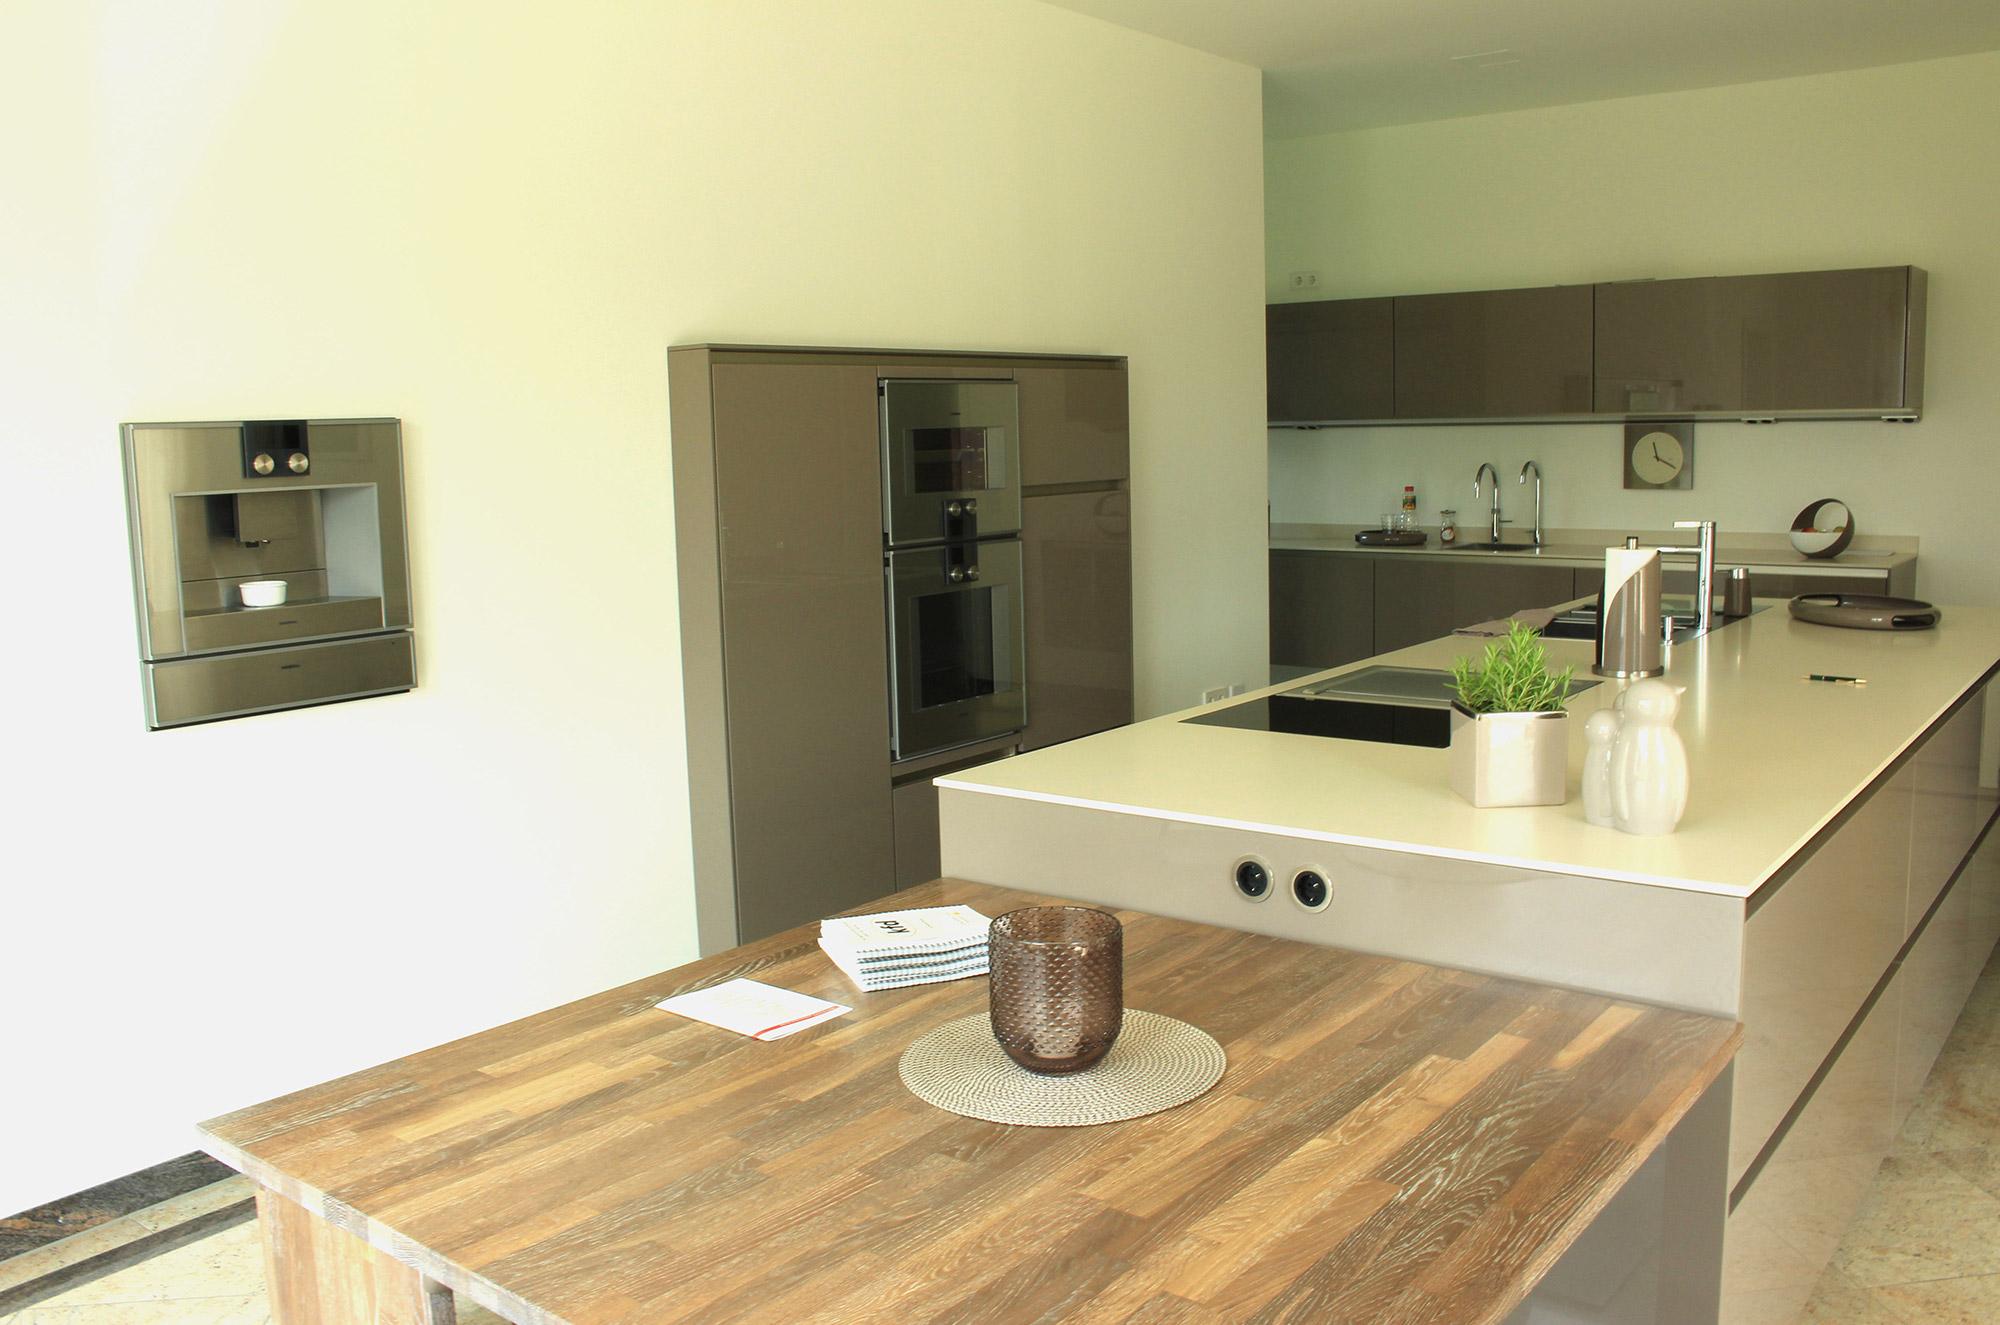 Bungalow-Hausbau Nordrhein Westfalen